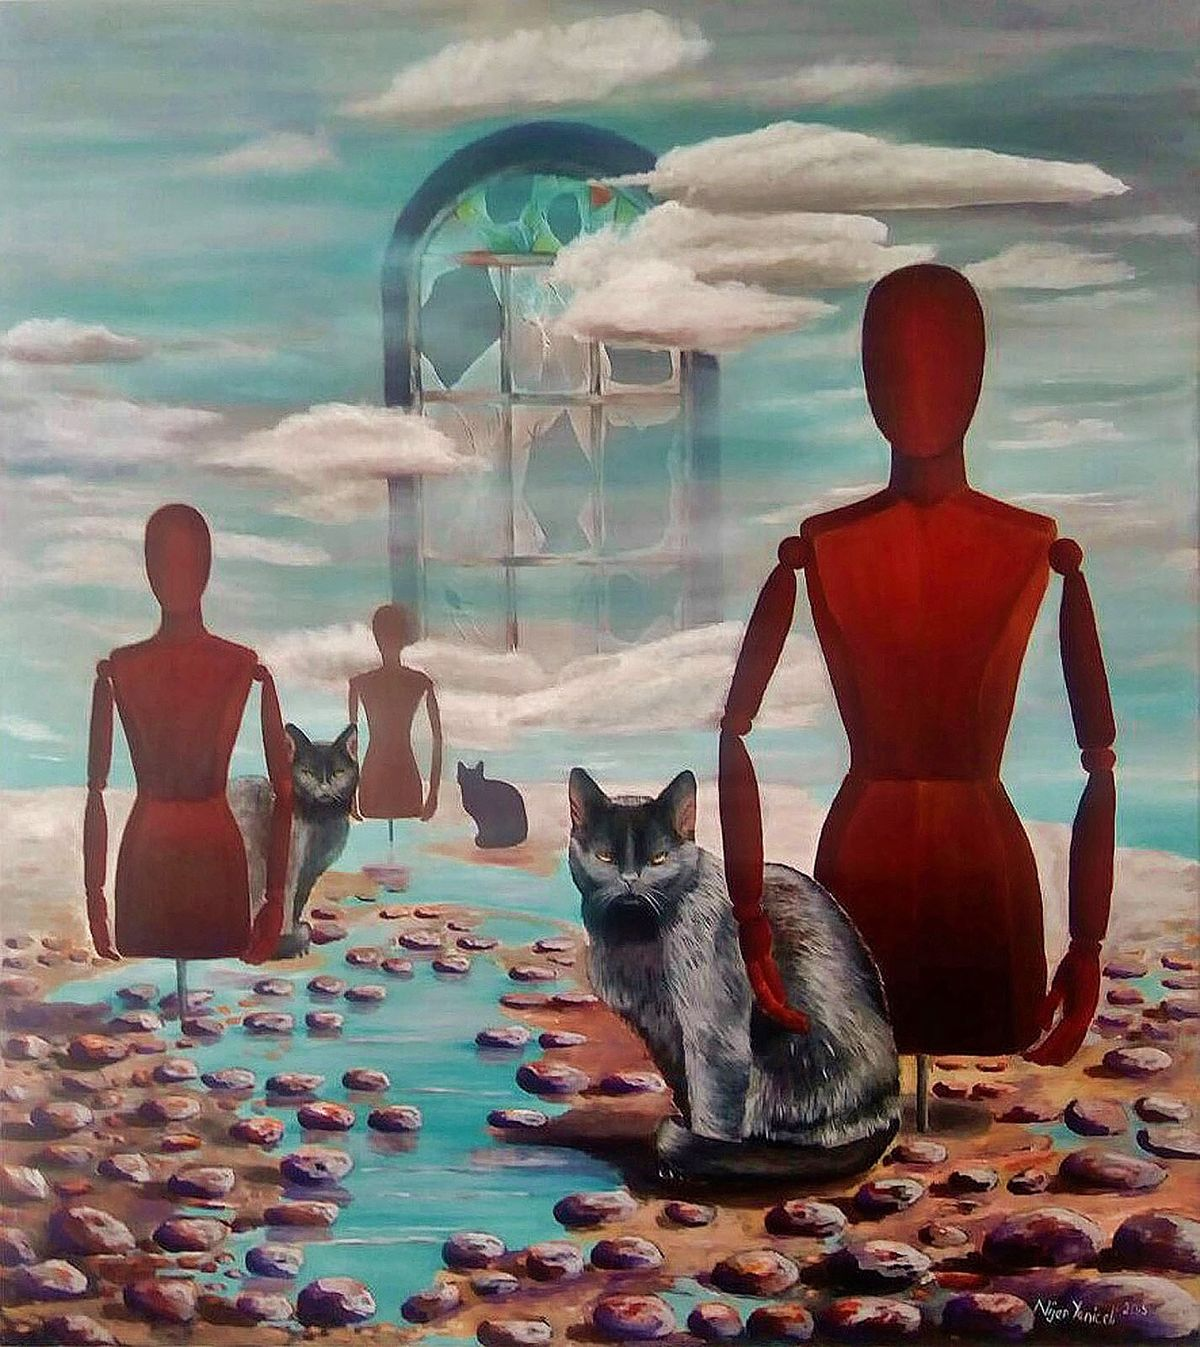 GALLERYMAK's Pinterest #sürrealizm Image created at 370702613065940163 -